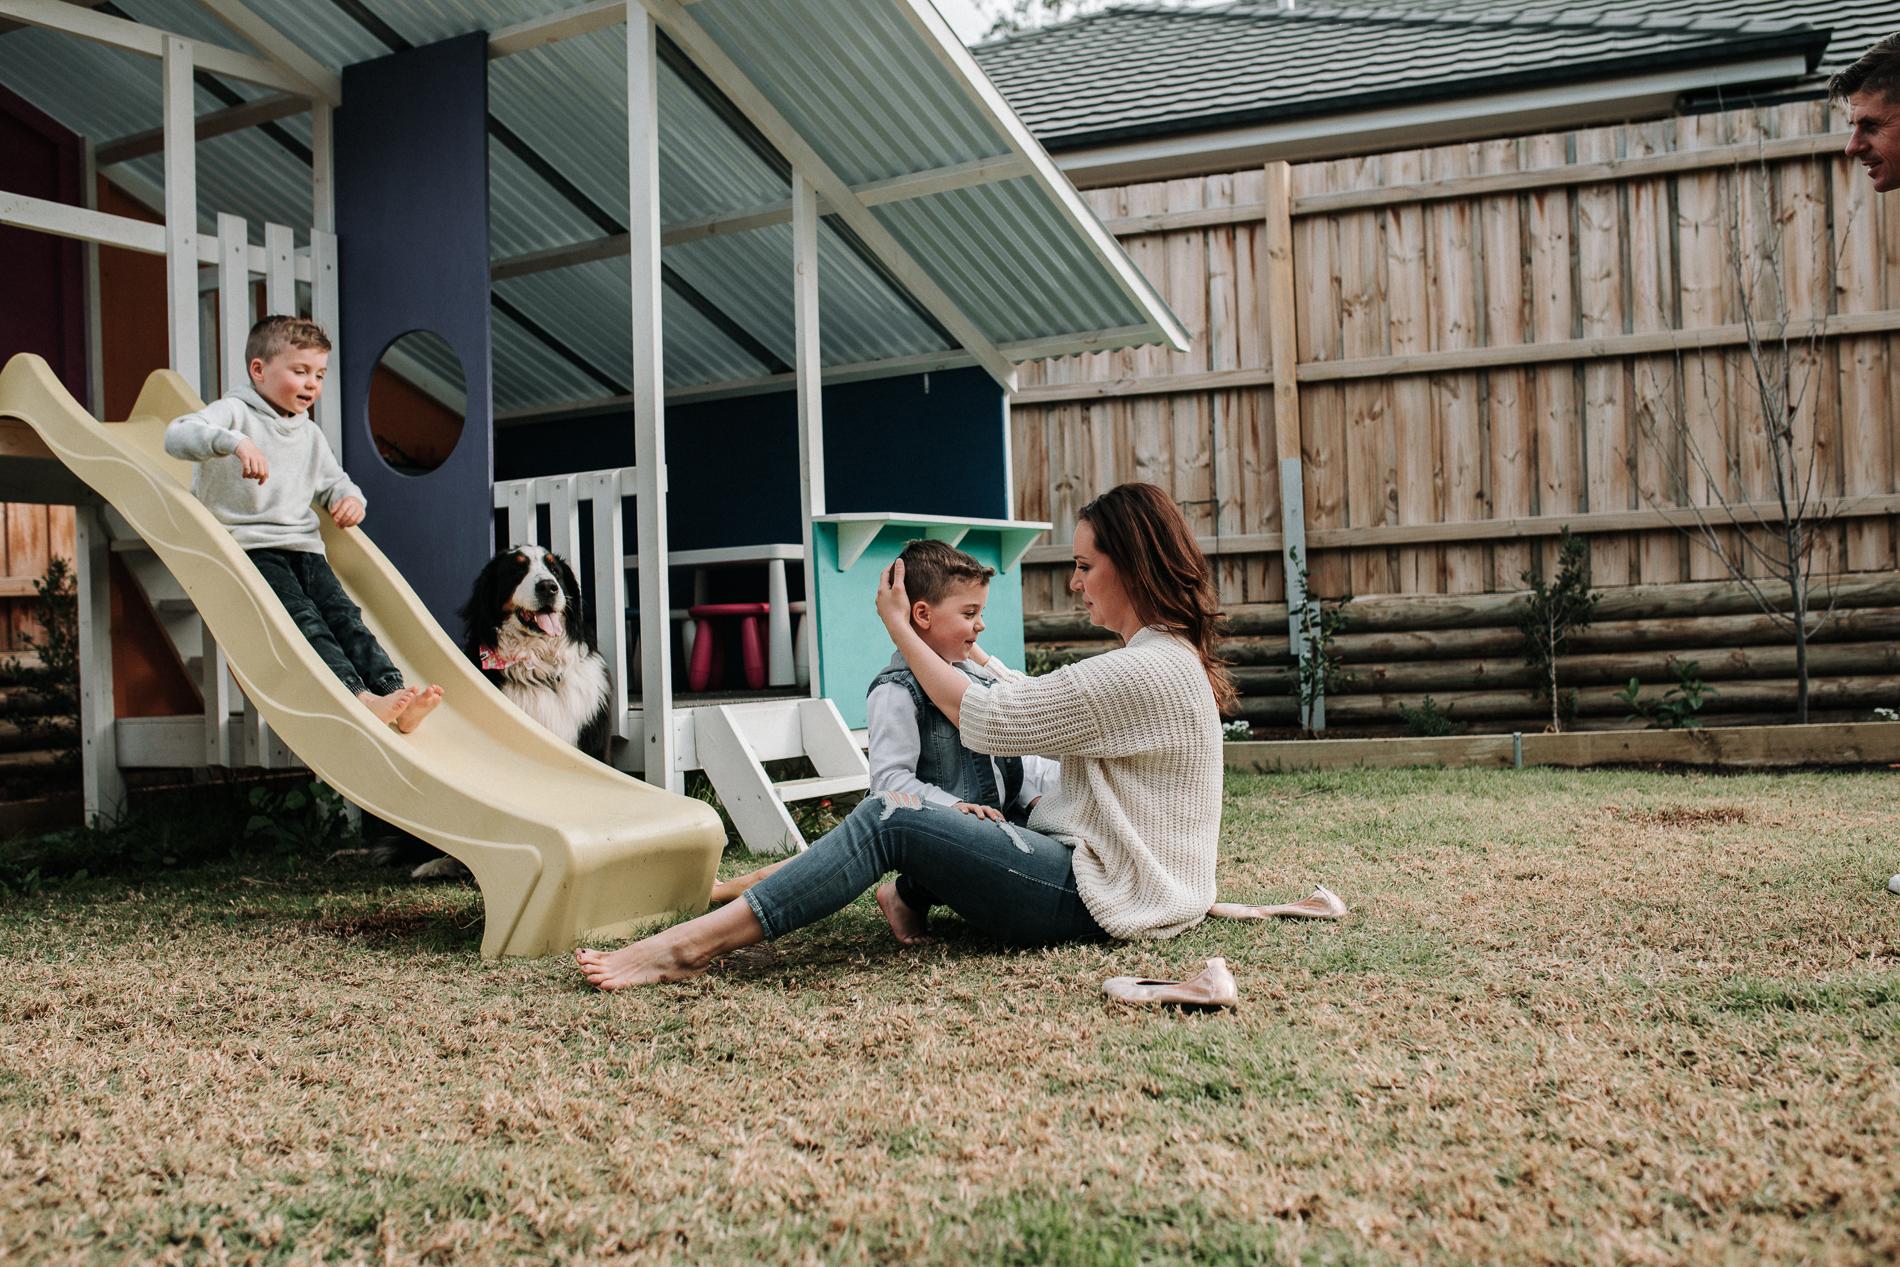 20180728_Sydney_Family_Photographer_ 2643.jpg